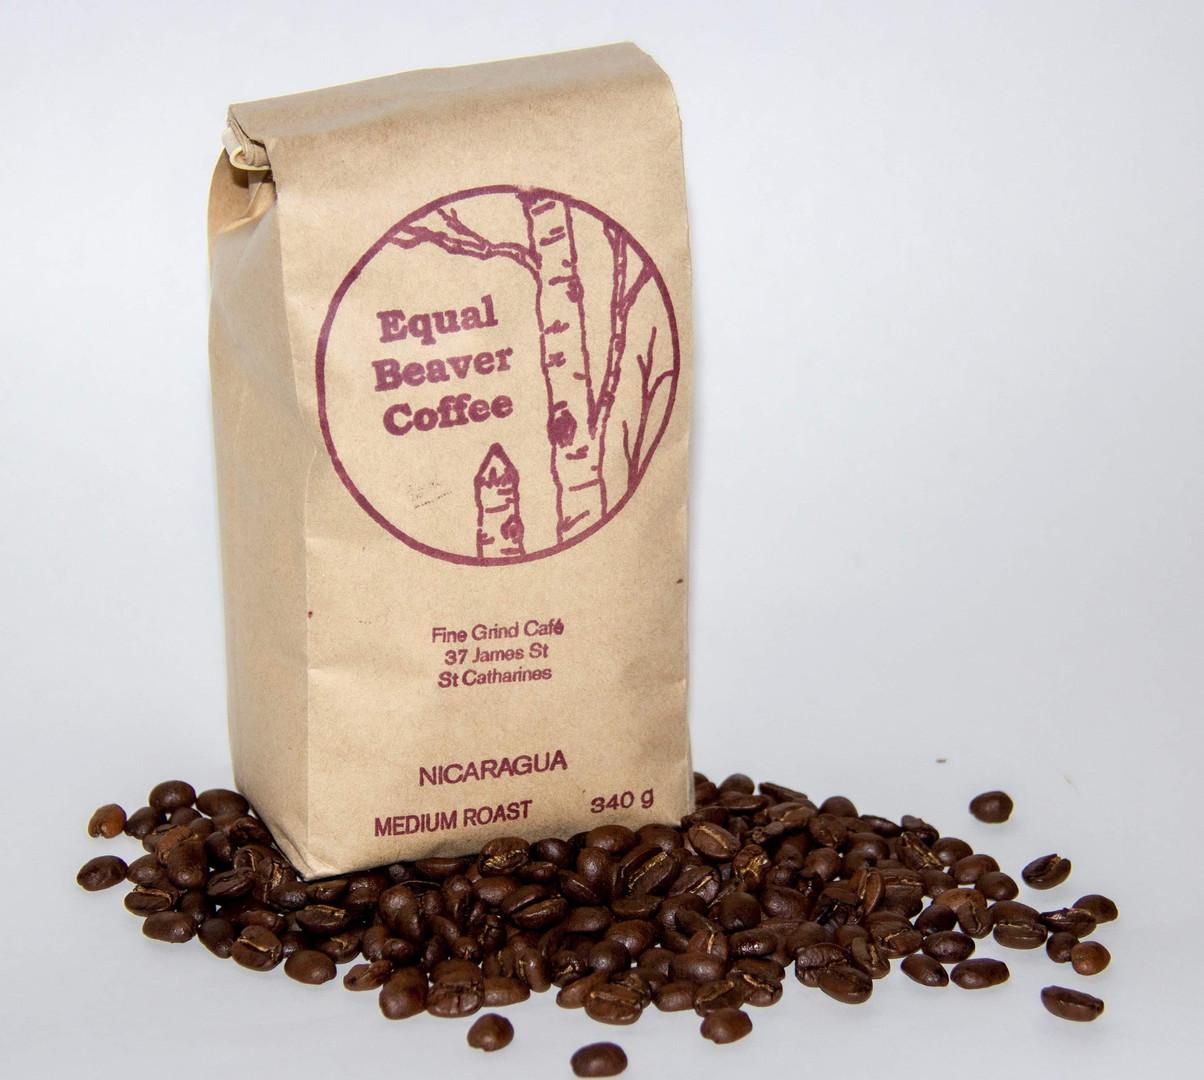 Equal Beaver Coffee Beans